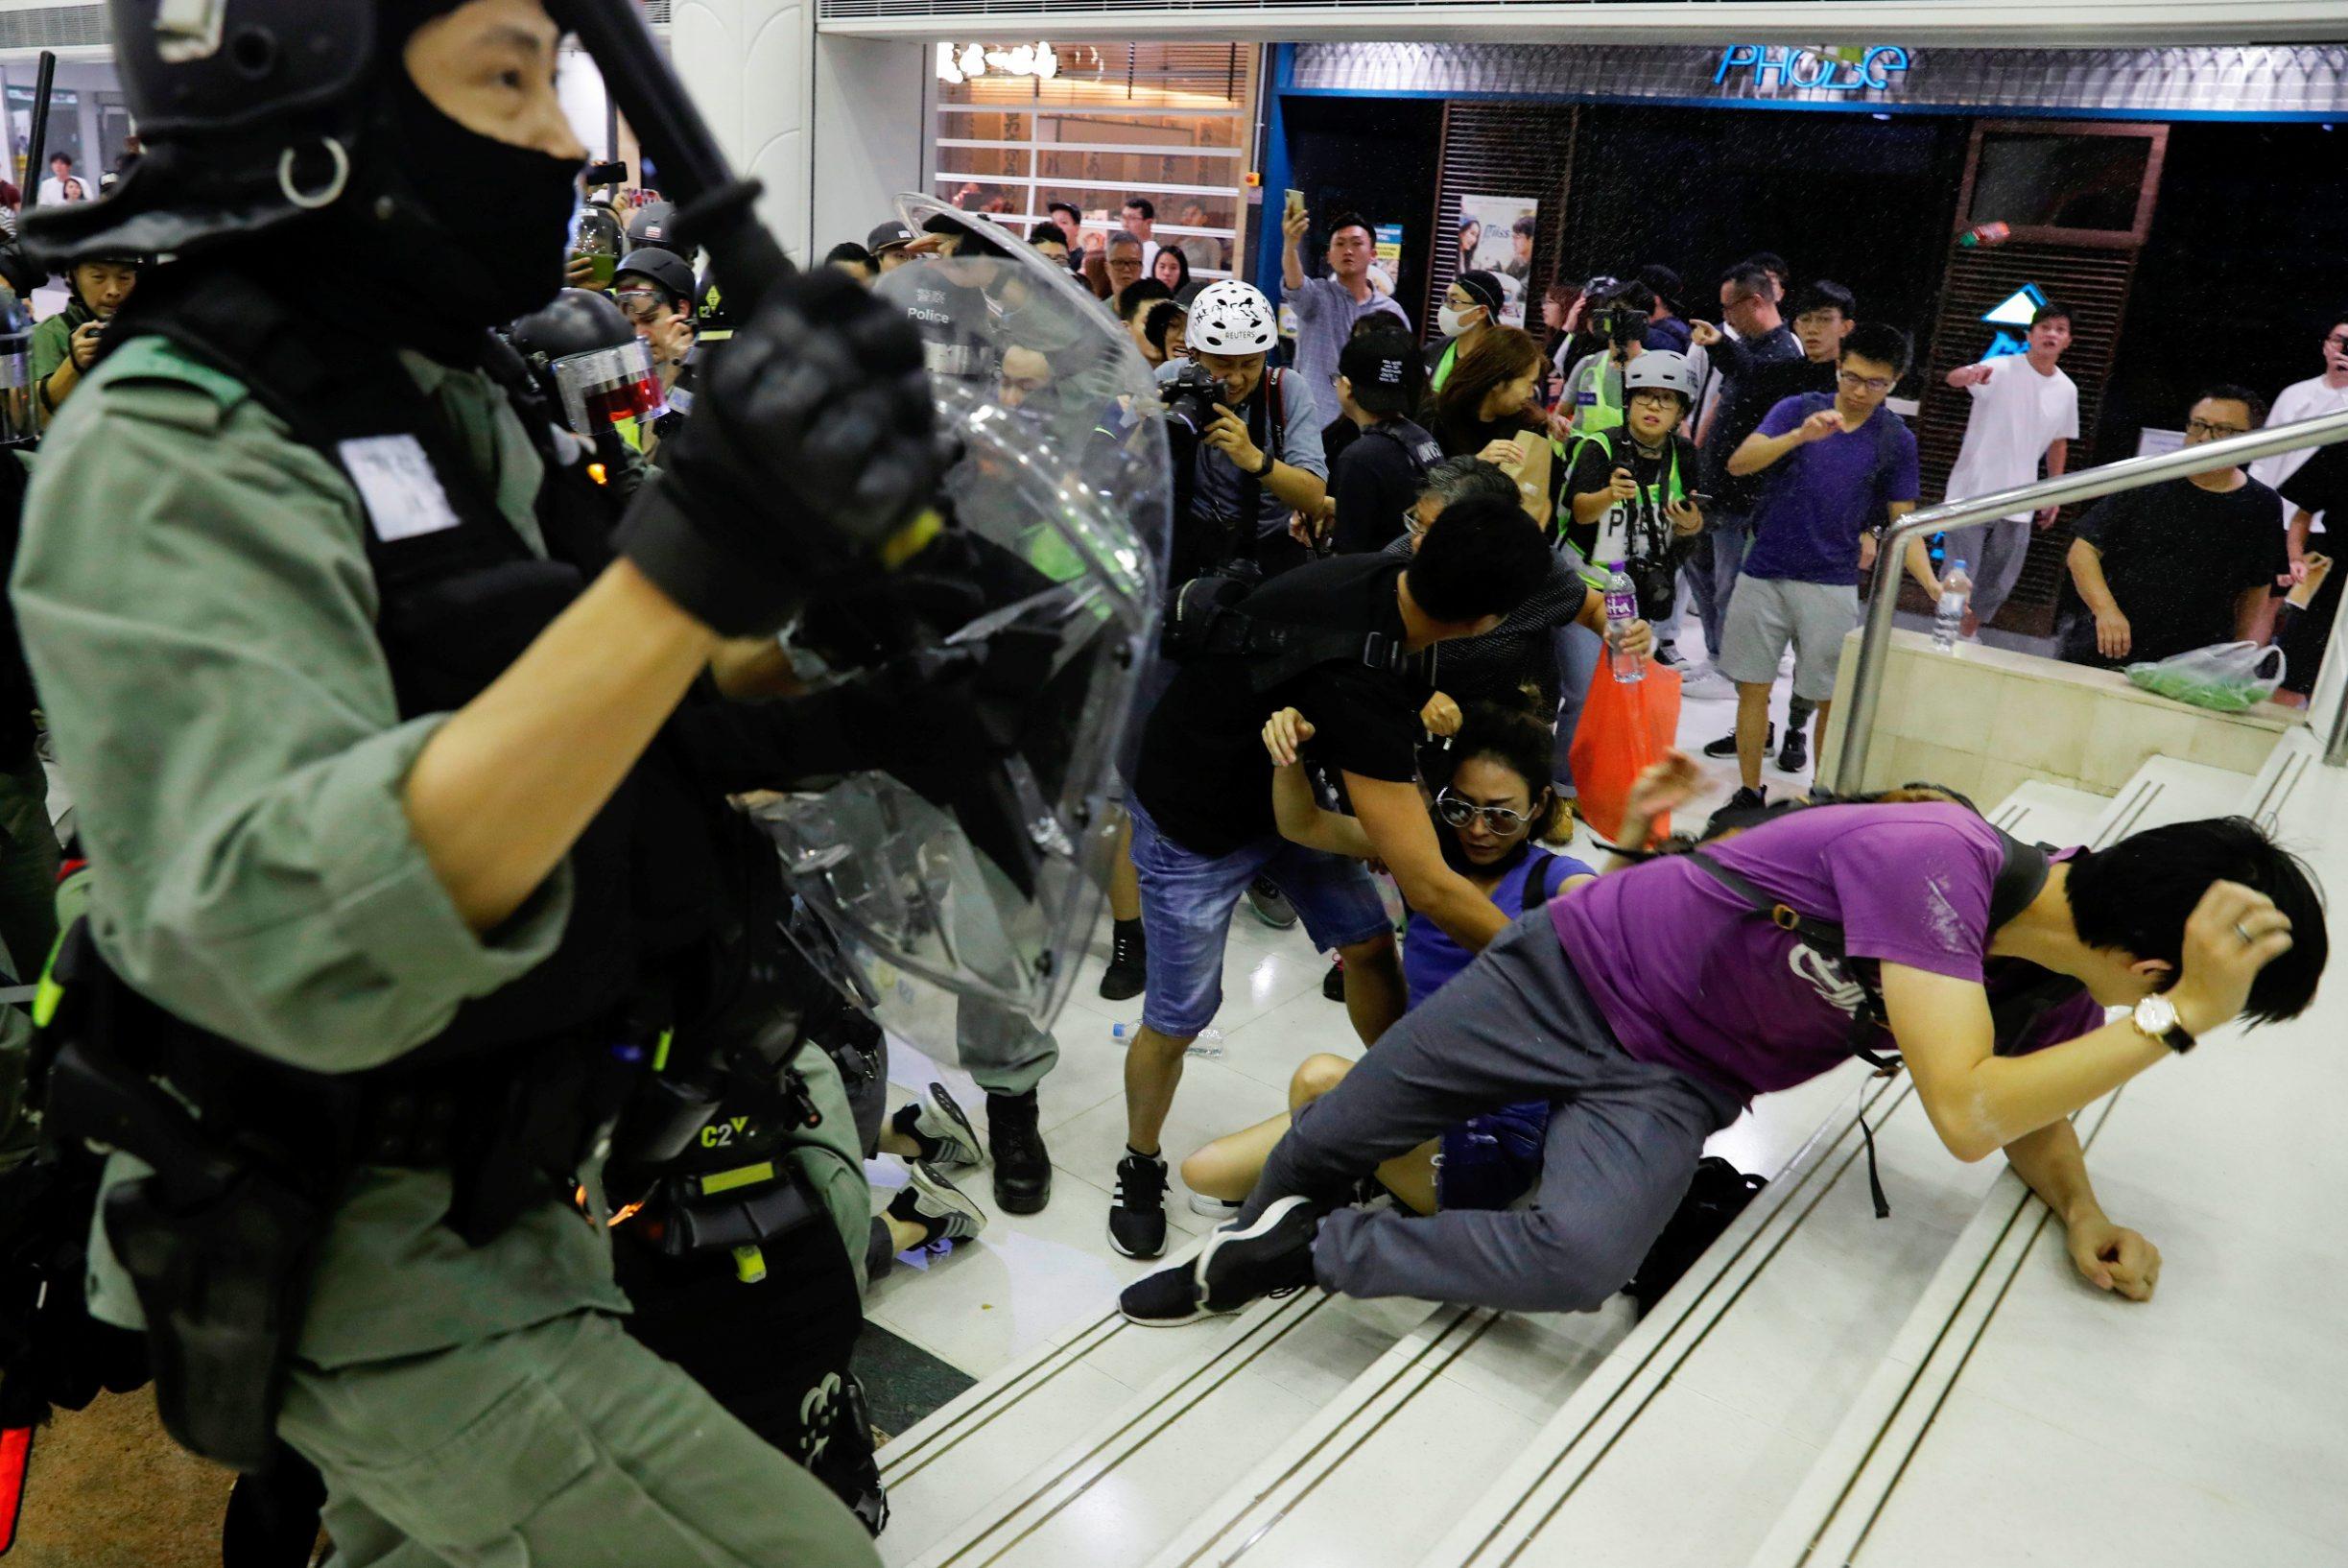 Riot police disperse anti-government protesters at a shopping mall in Tai Po, Hong Kong, China November 3, 2019. REUTERS/Tyrone Siu